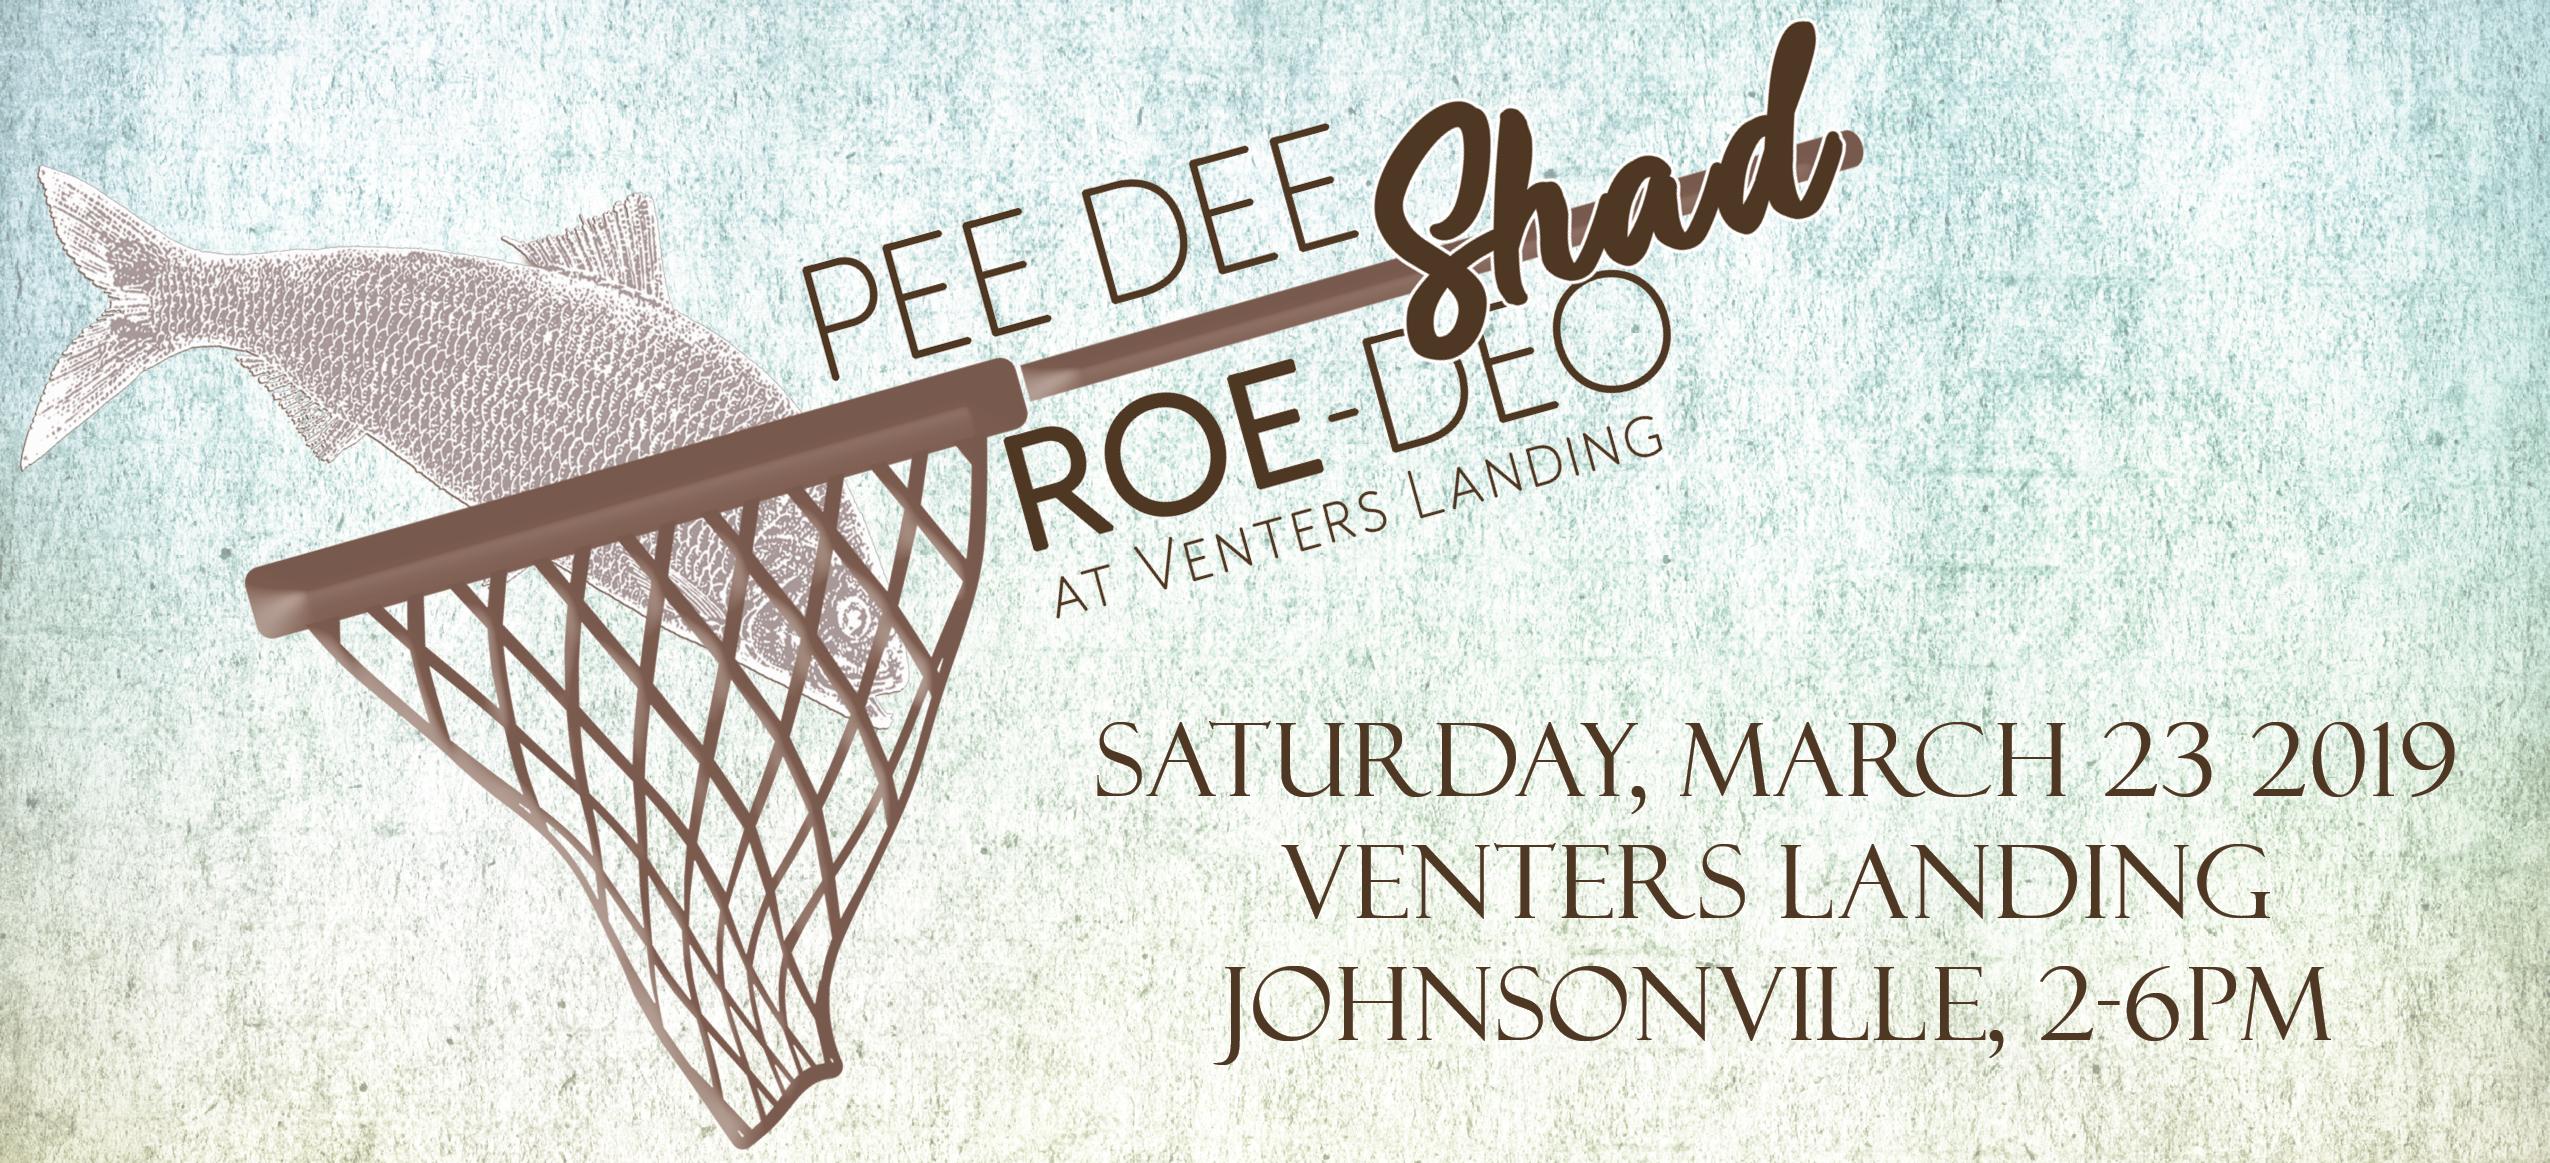 Pee Dee Shad Roe-deo